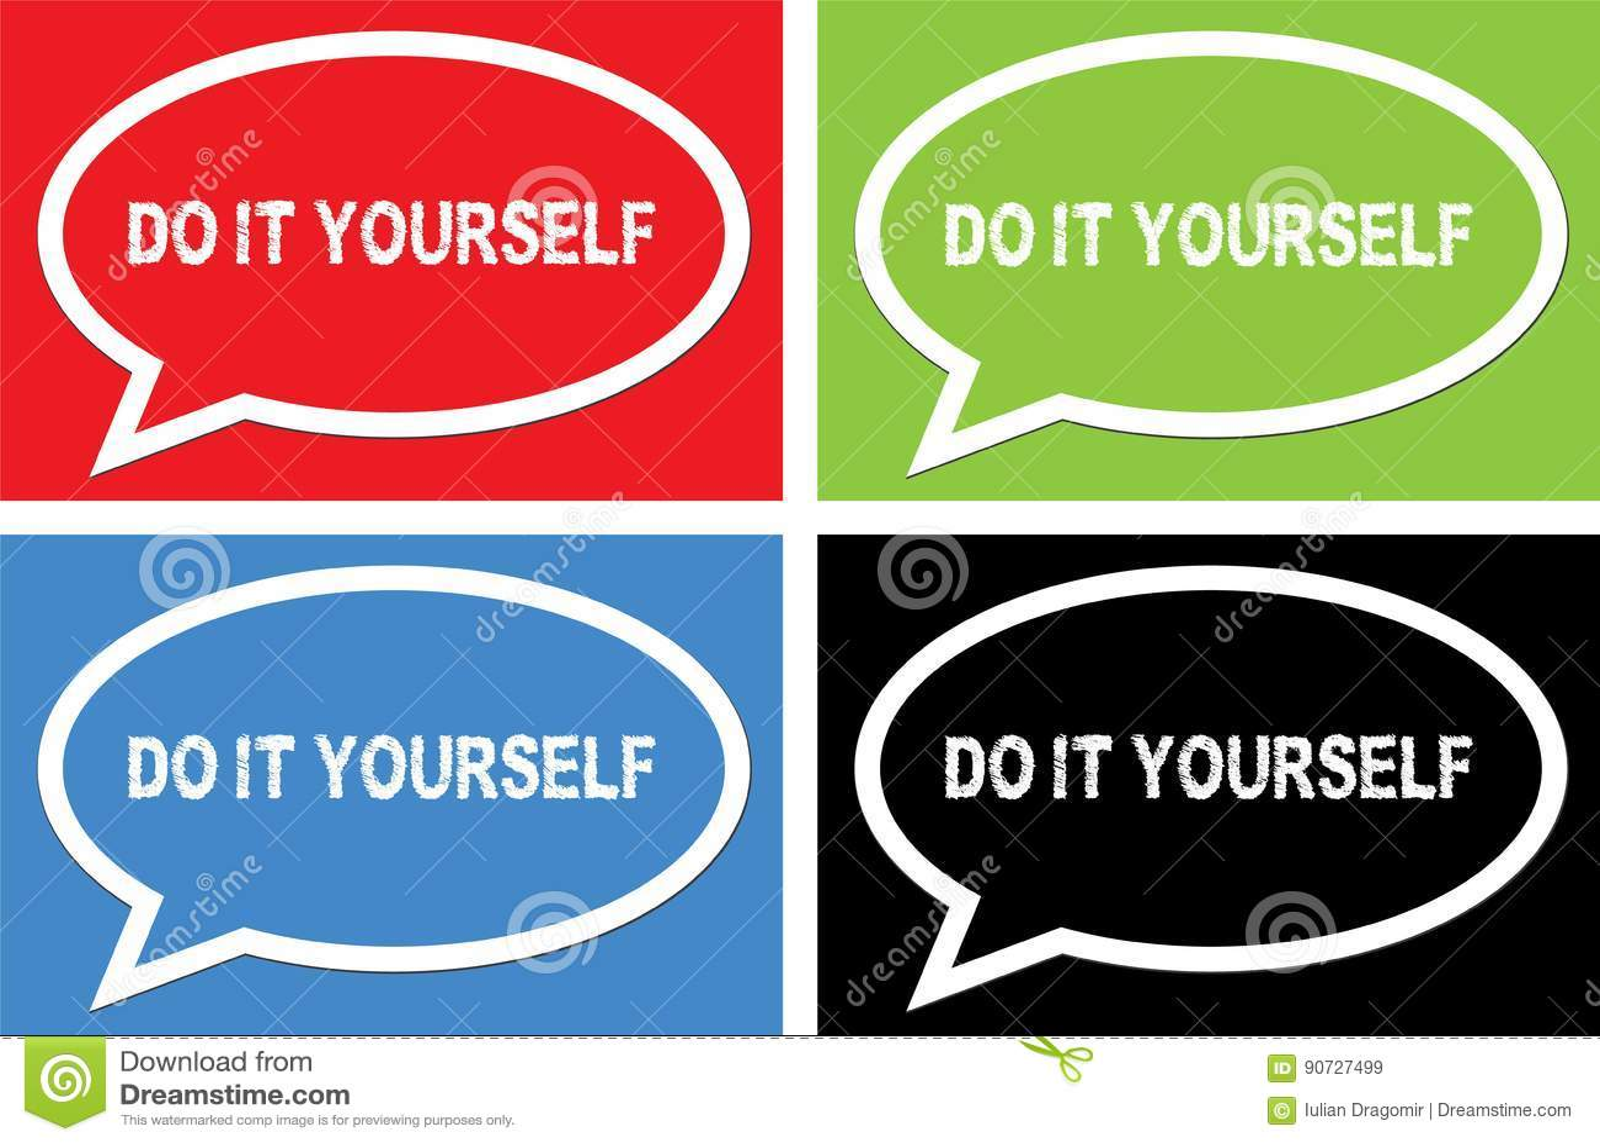 Do it yourself text on ellipse speech bubble sign stock do it yourself text on ellipse speech bubble sign solutioingenieria Choice Image